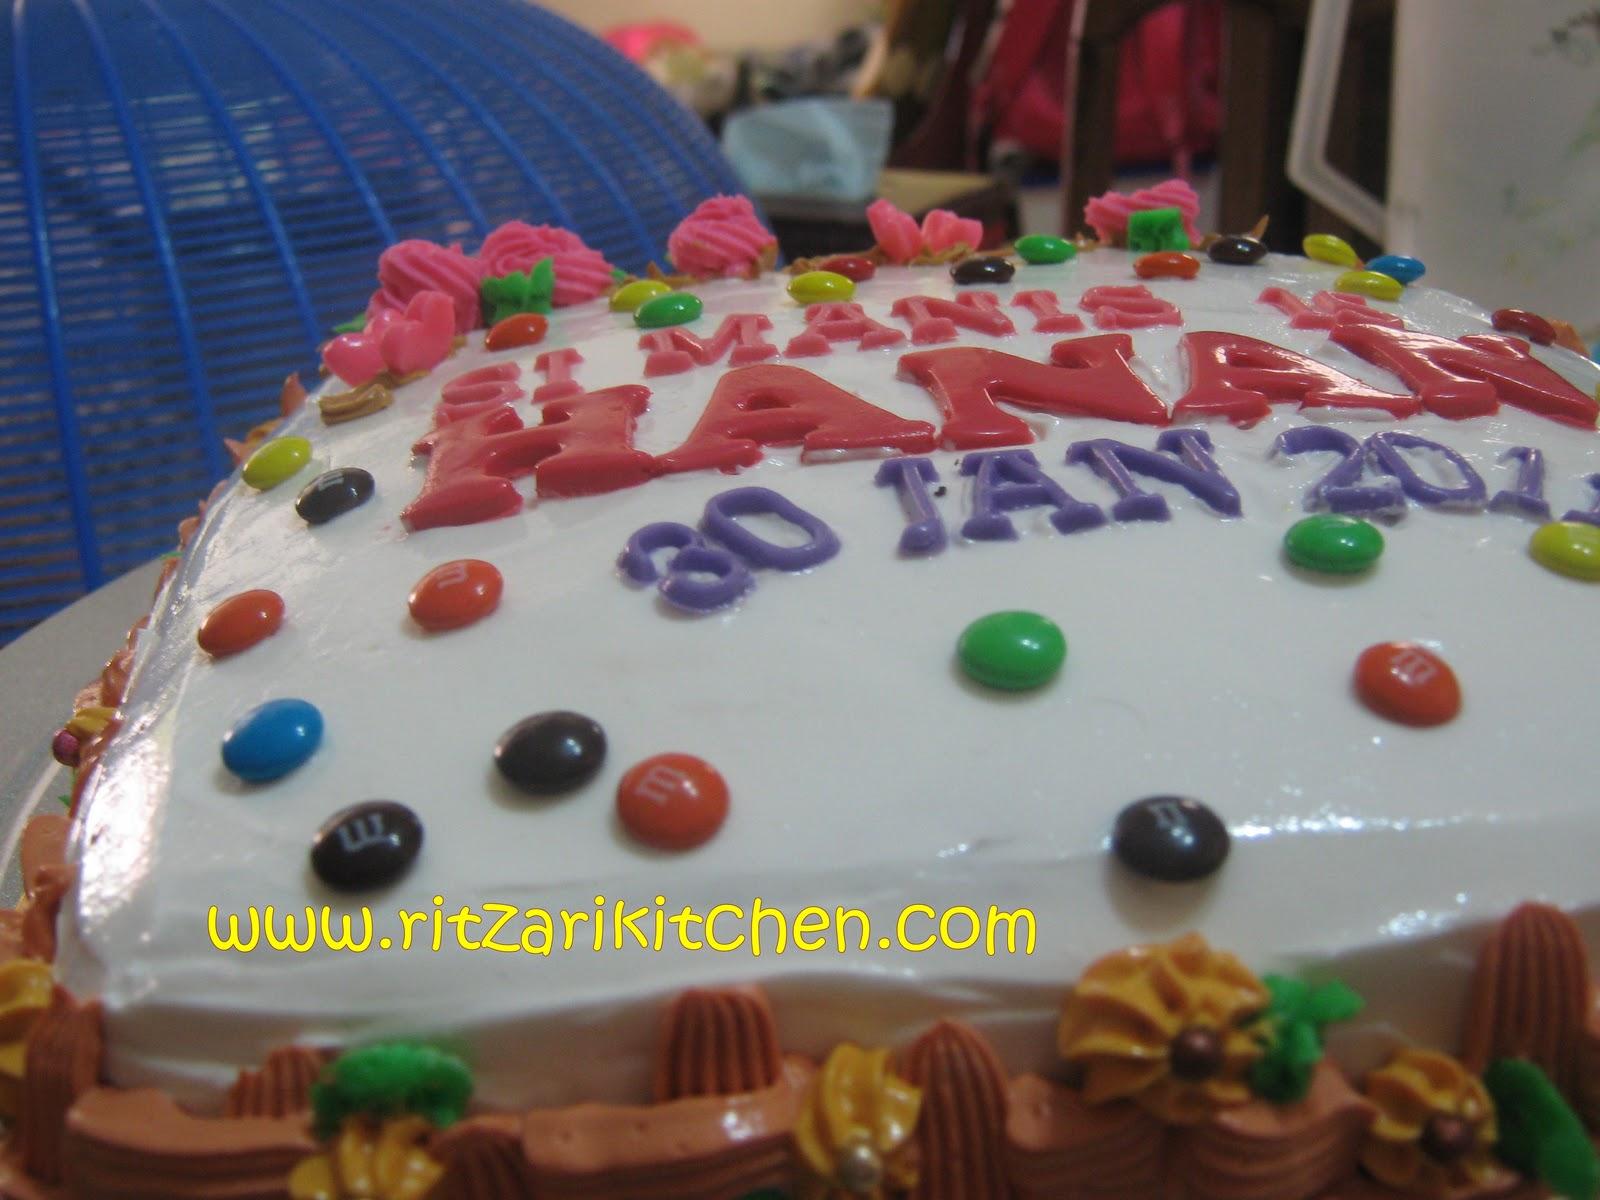 Free Cake Decorating Ideas For Beginners 65176 Cake Decora